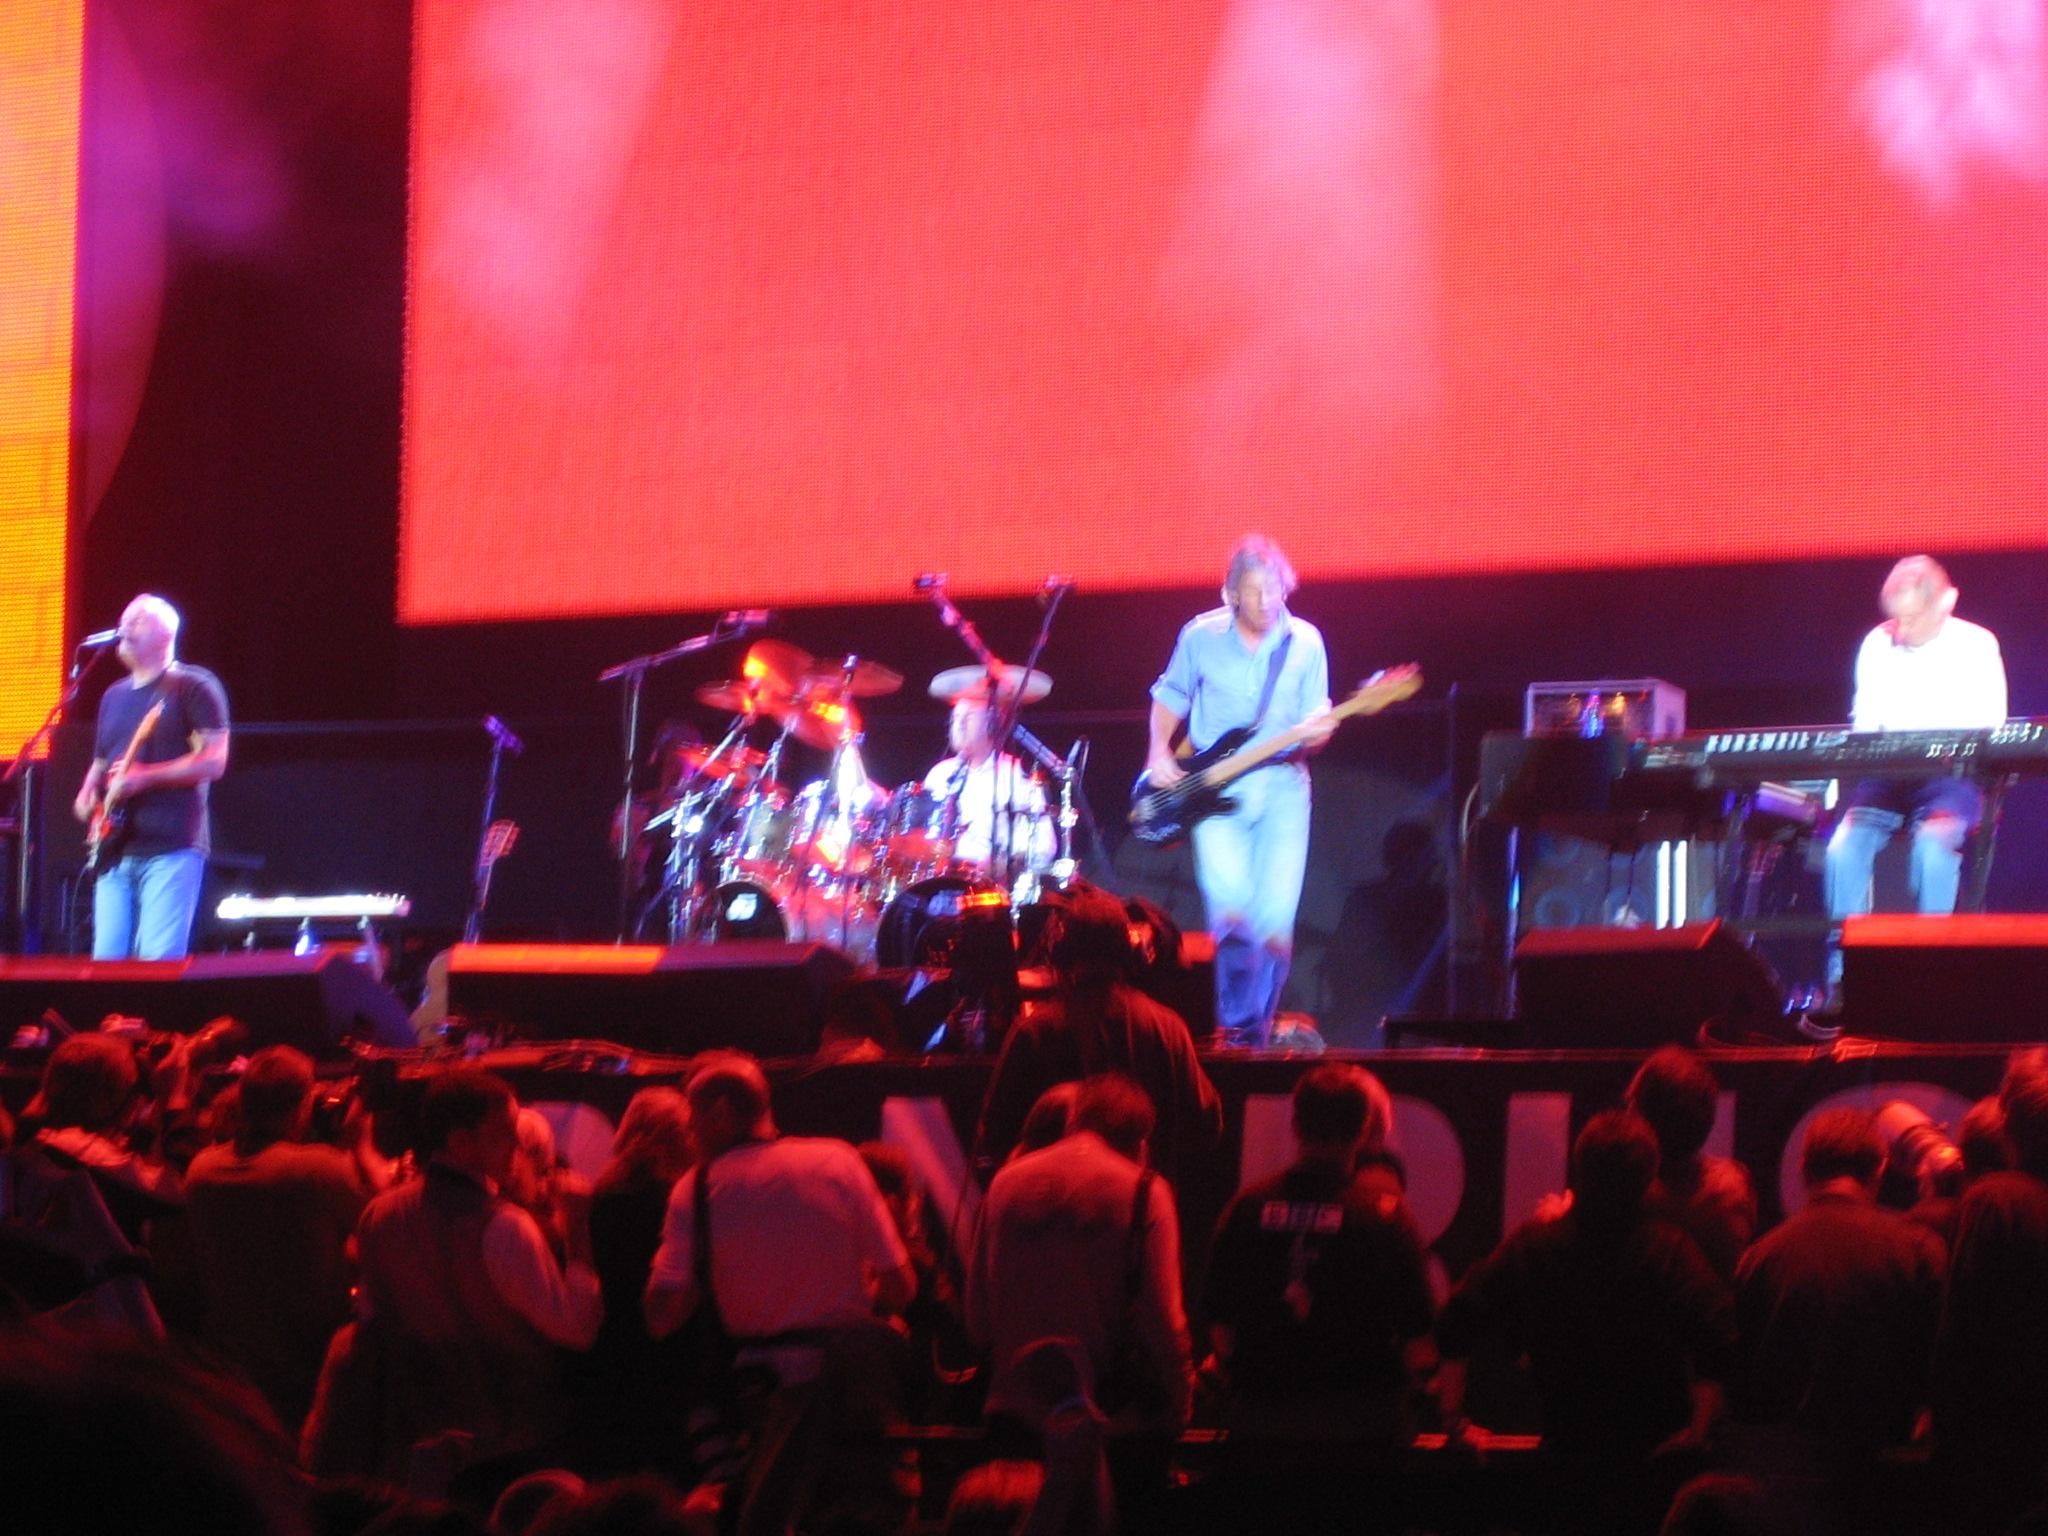 File:London, Live 8, Pink Floyd.jpg - Wikimedia Commons